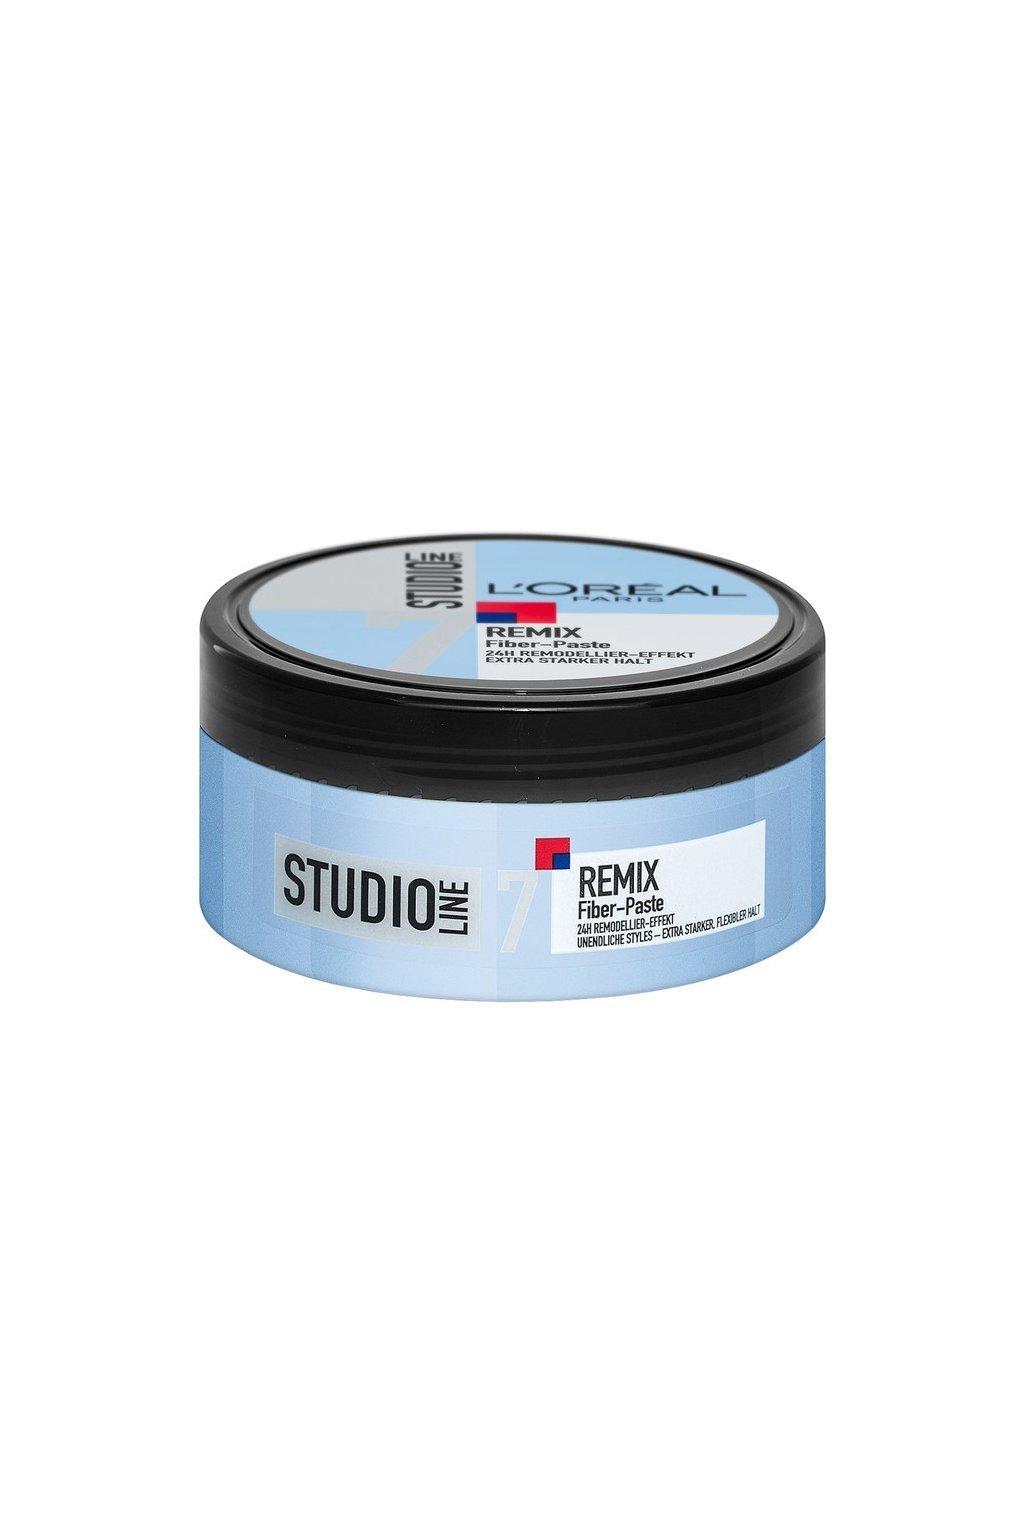 loreal studio line 7 remix modelacni kren 150ml